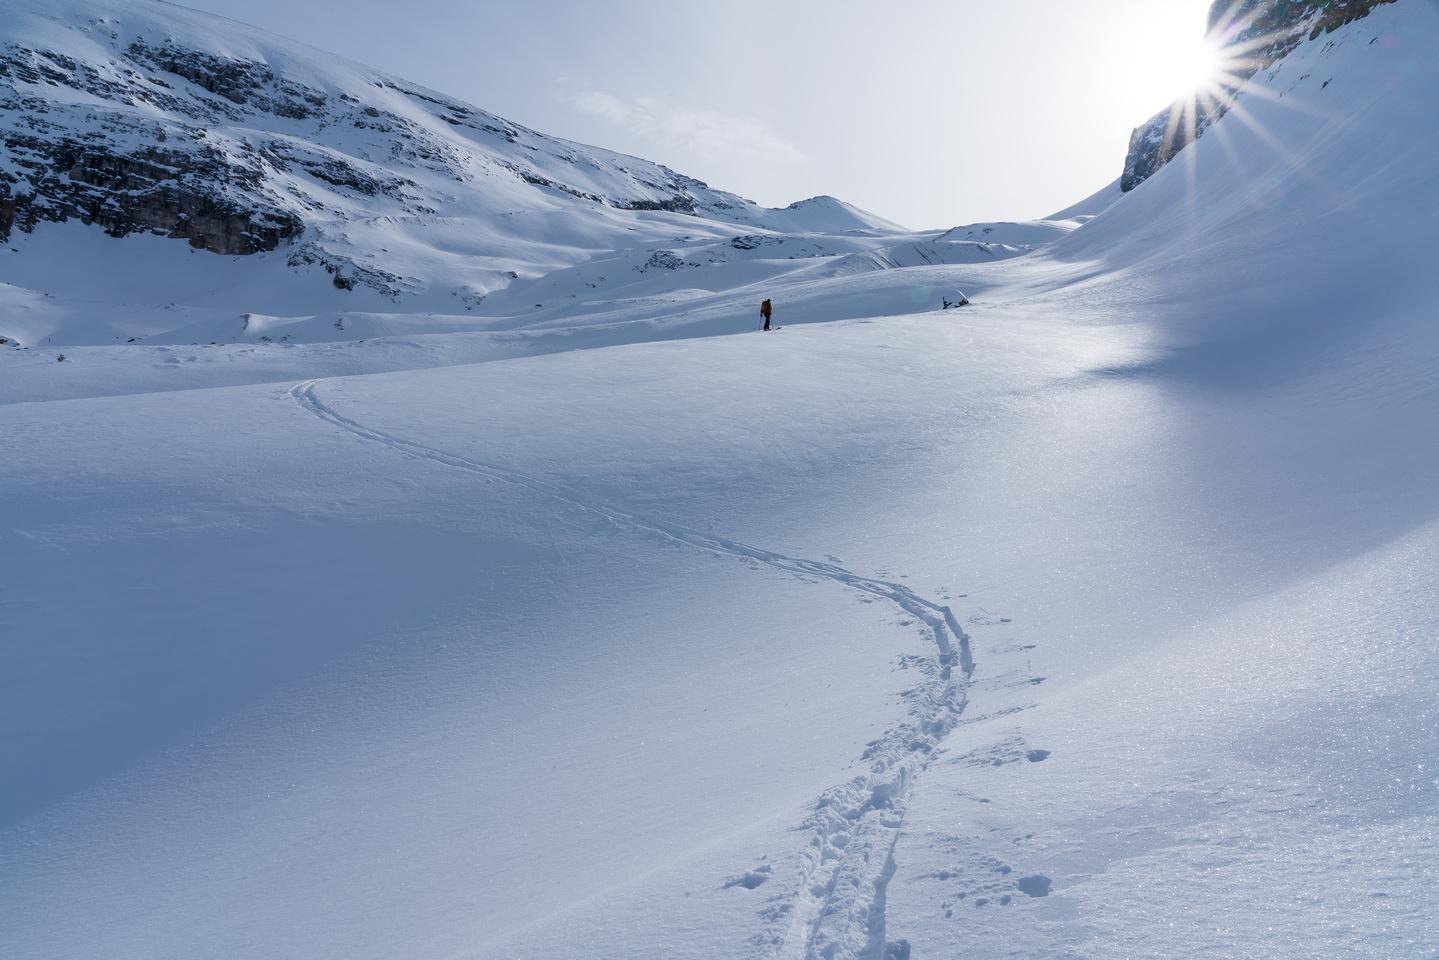 Contouring under Vulture Peak (R), towards the left-hand line.